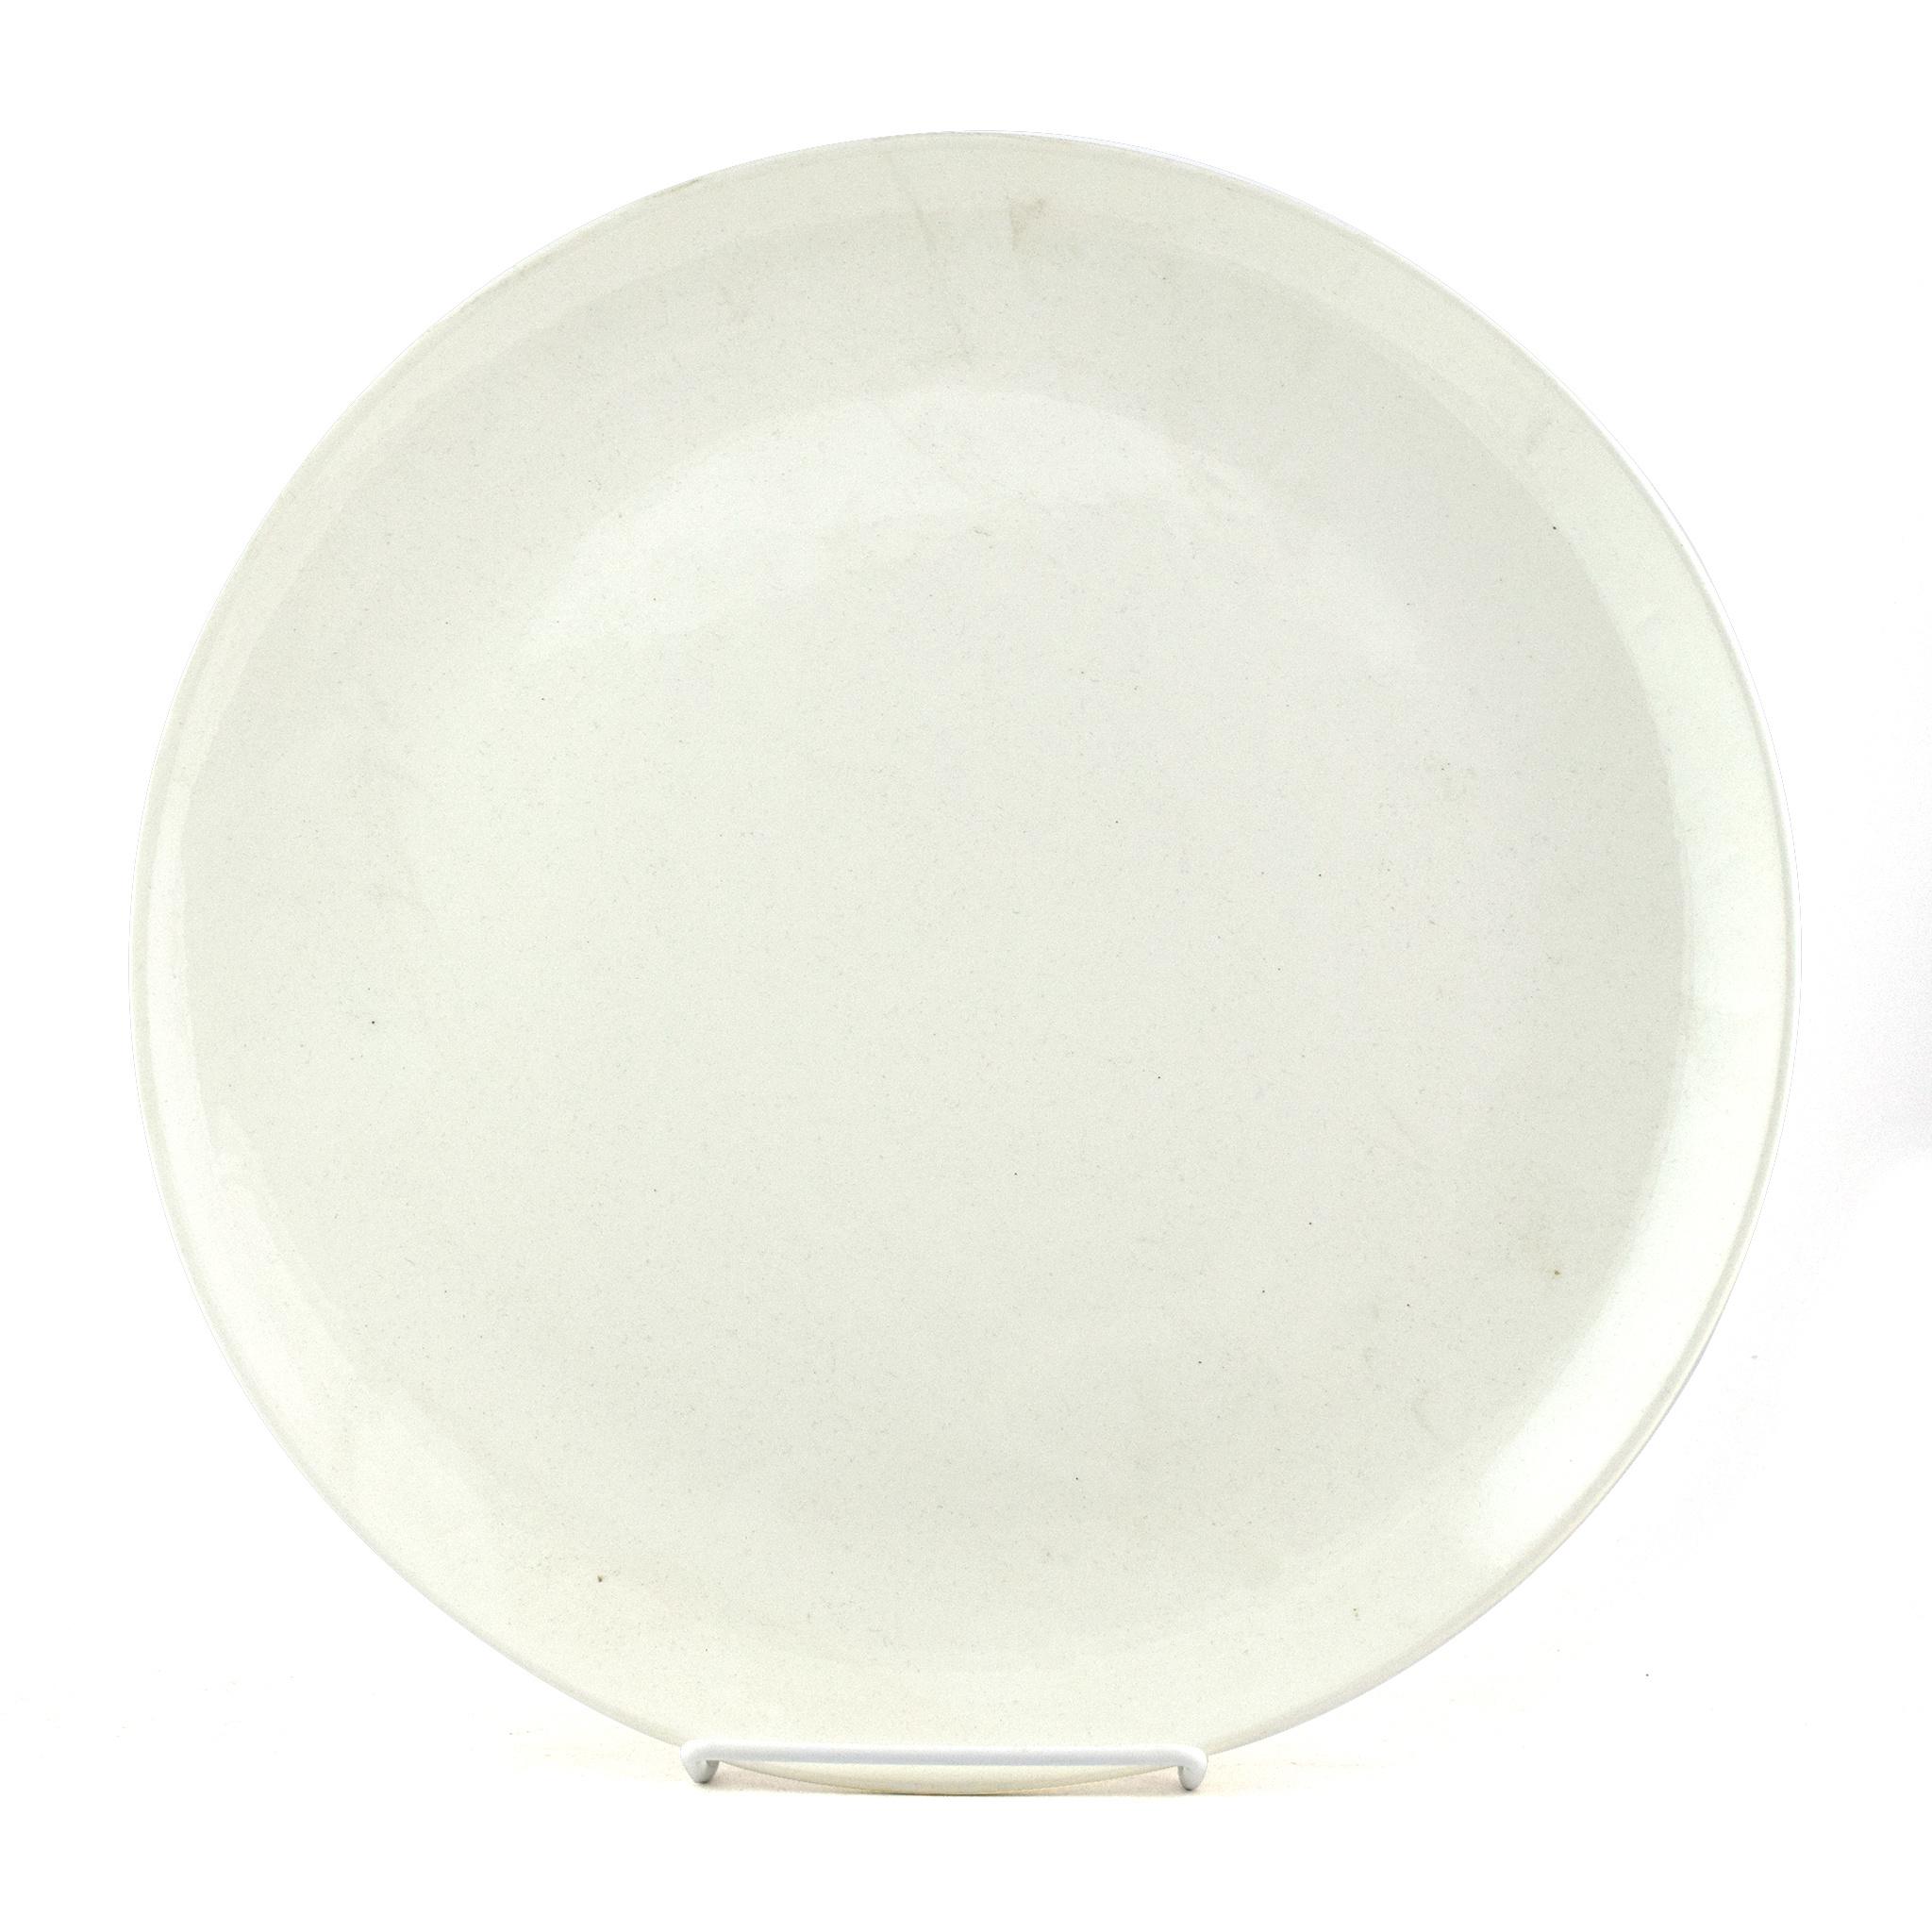 Hycroft Plates